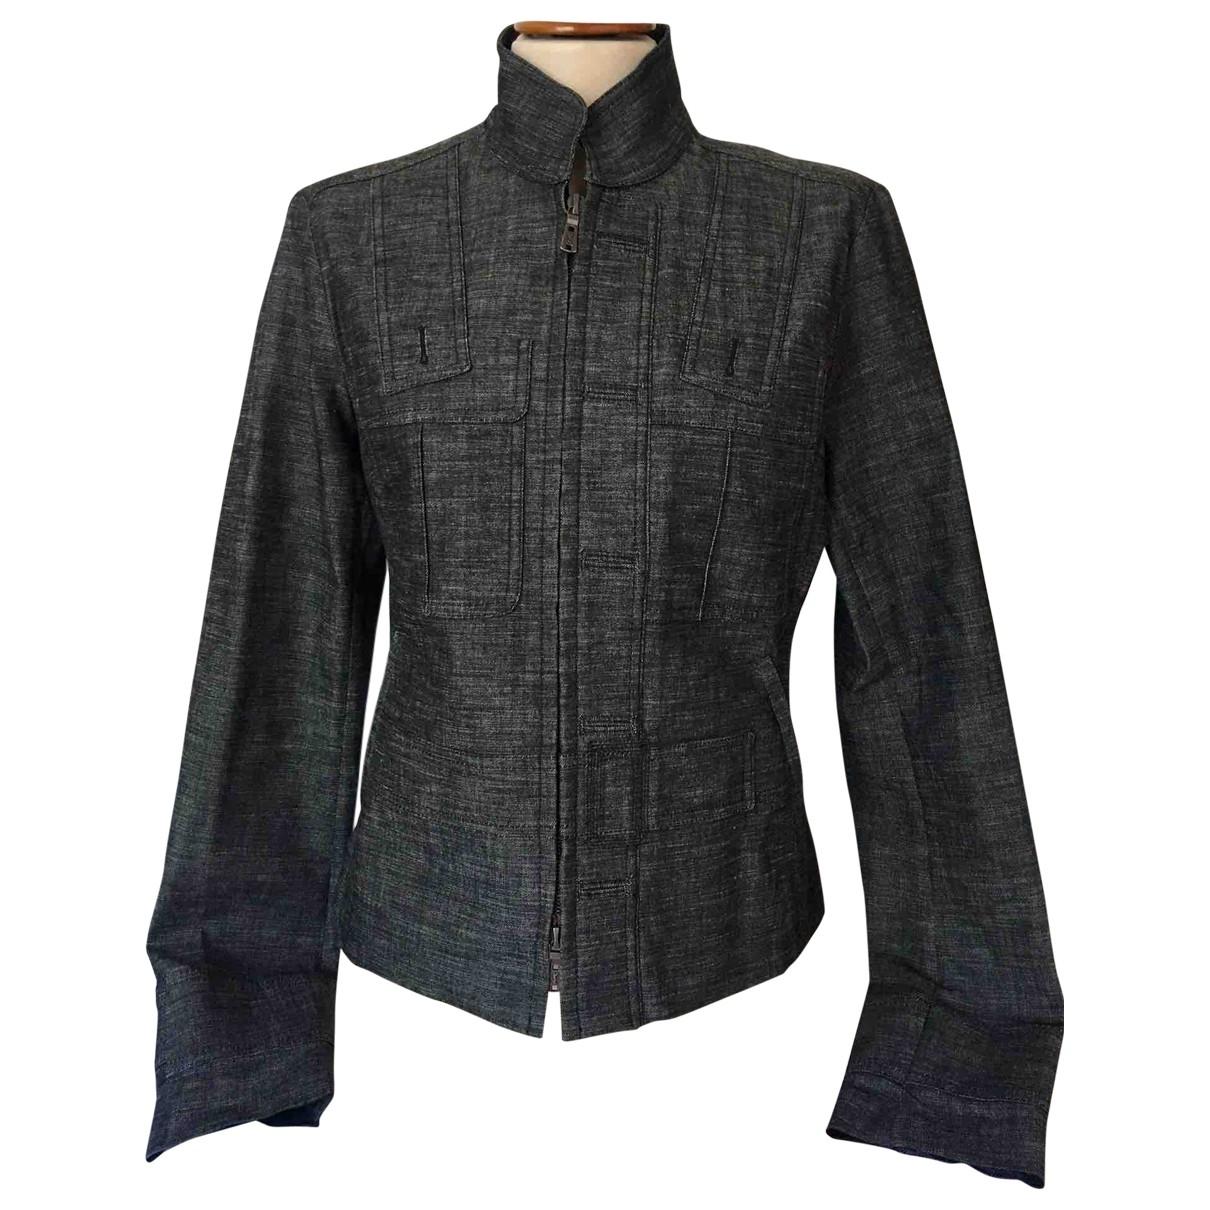 Yves Saint Laurent \N Grey Cotton jacket for Women 42 FR